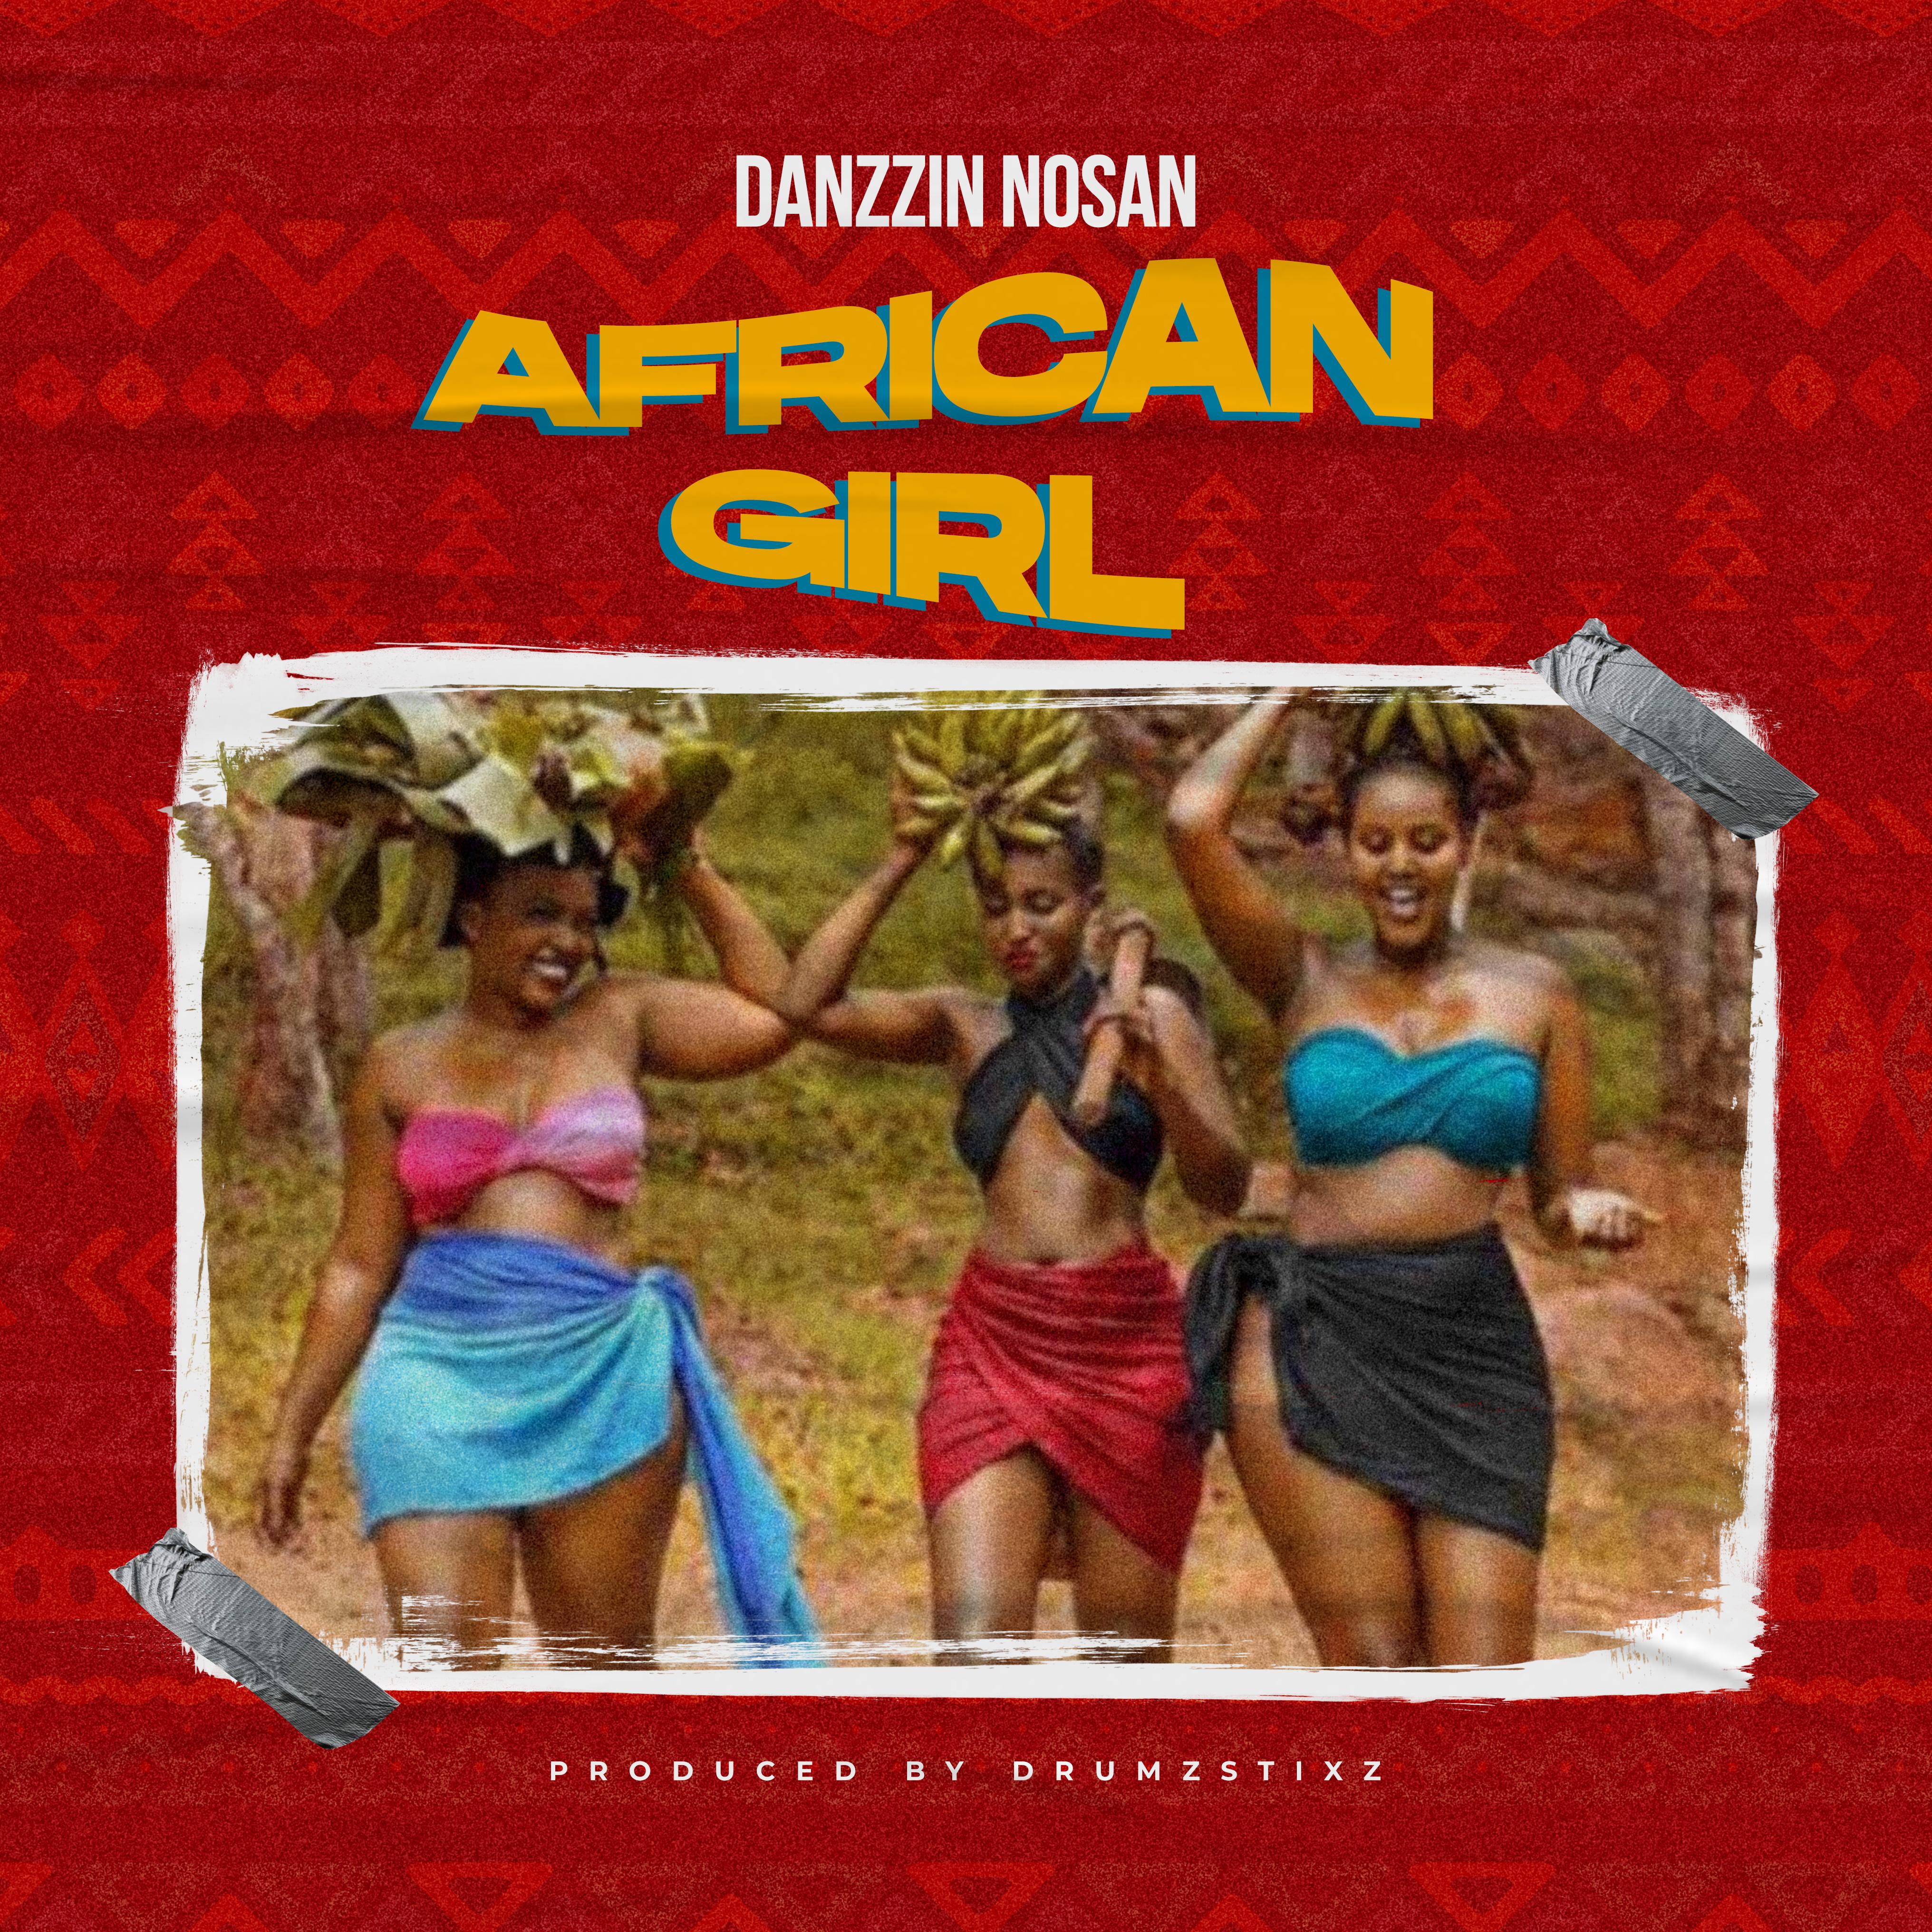 dazzin nosan - African Girl